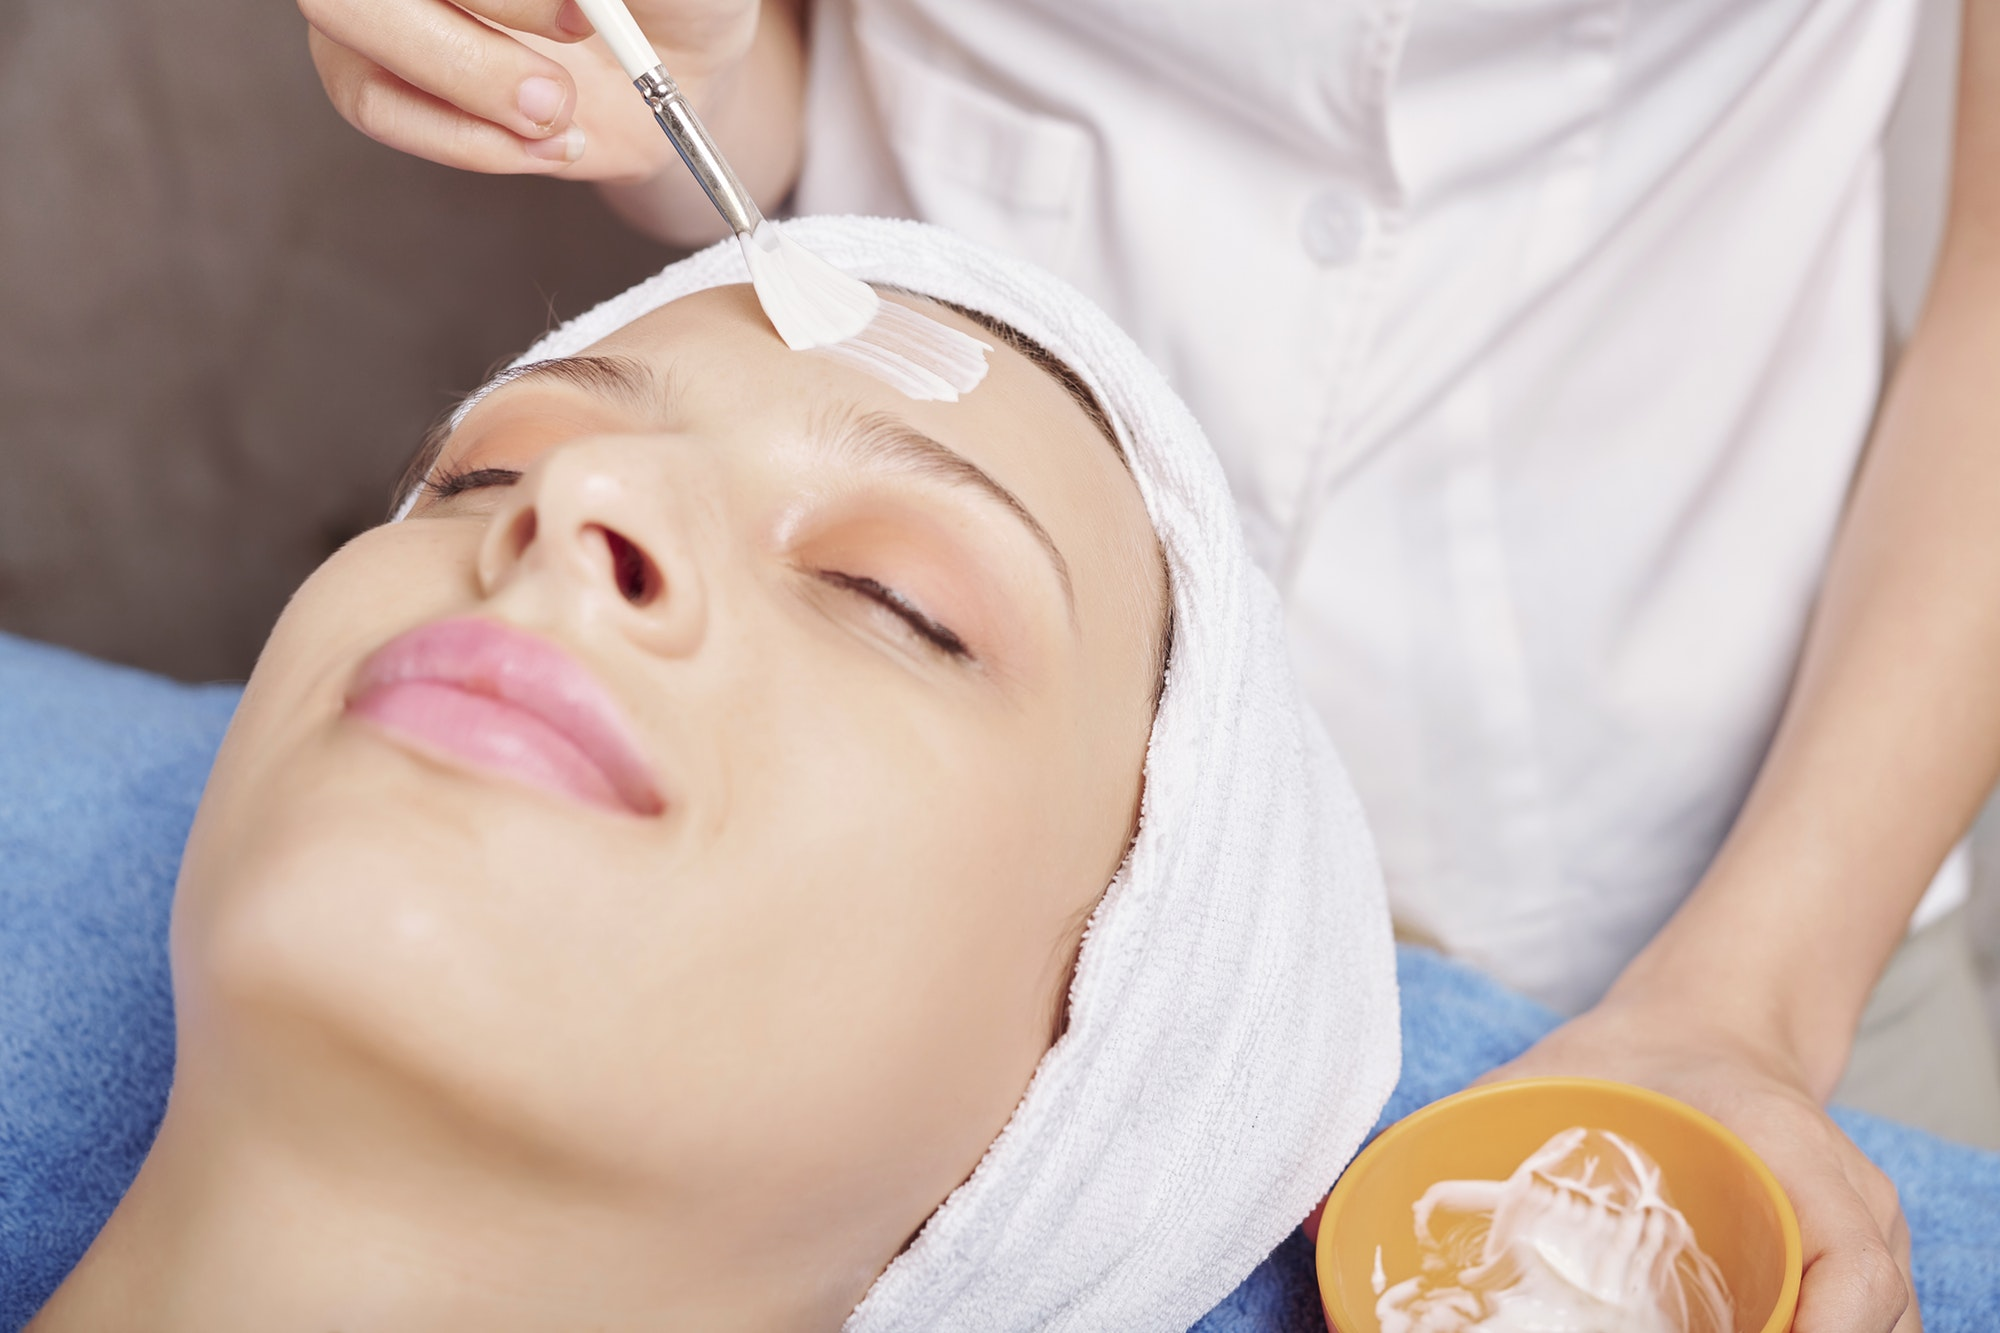 Woman enjoying beauty procedure